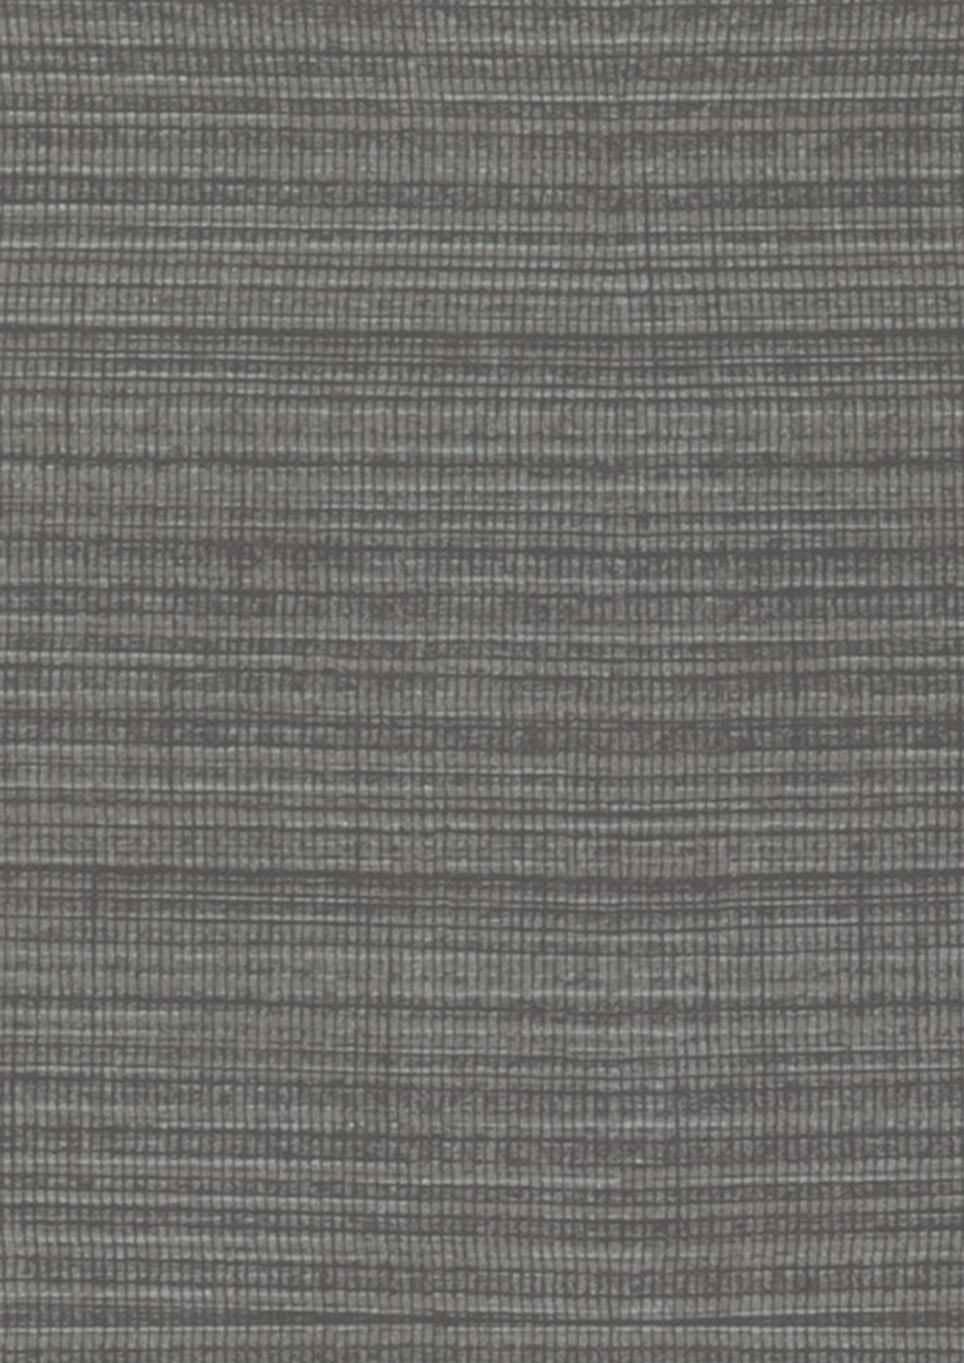 Tapete melinda grau anthrazit hellblaugrau schimmer for Tapete nach hause